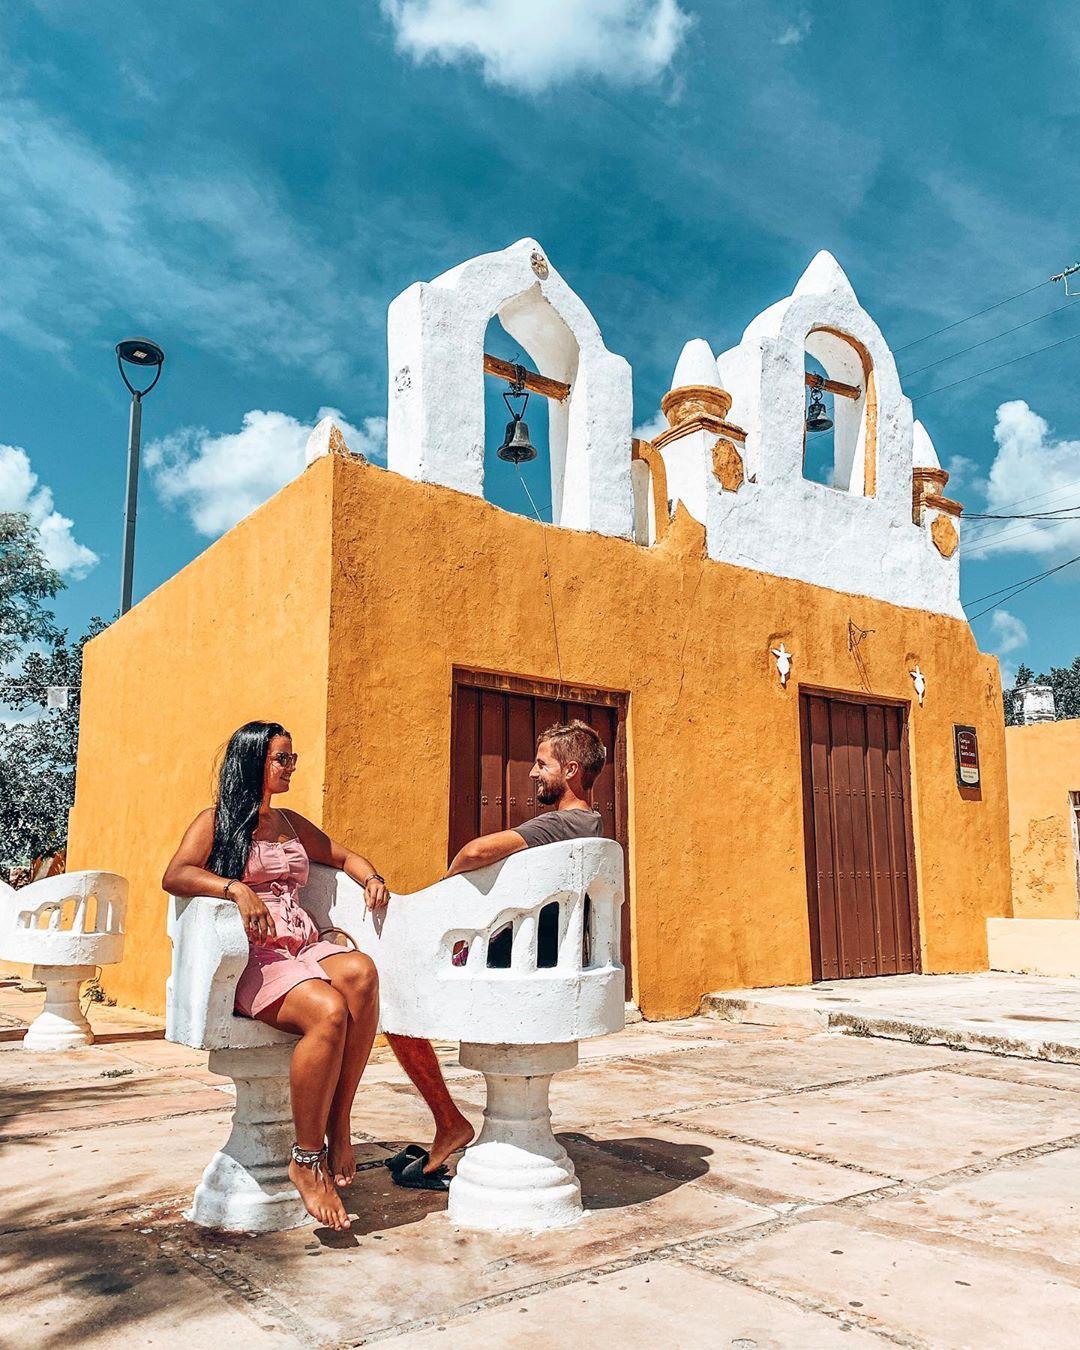 izamal yucatan la capilla de santa cruz, top yucatan instagram